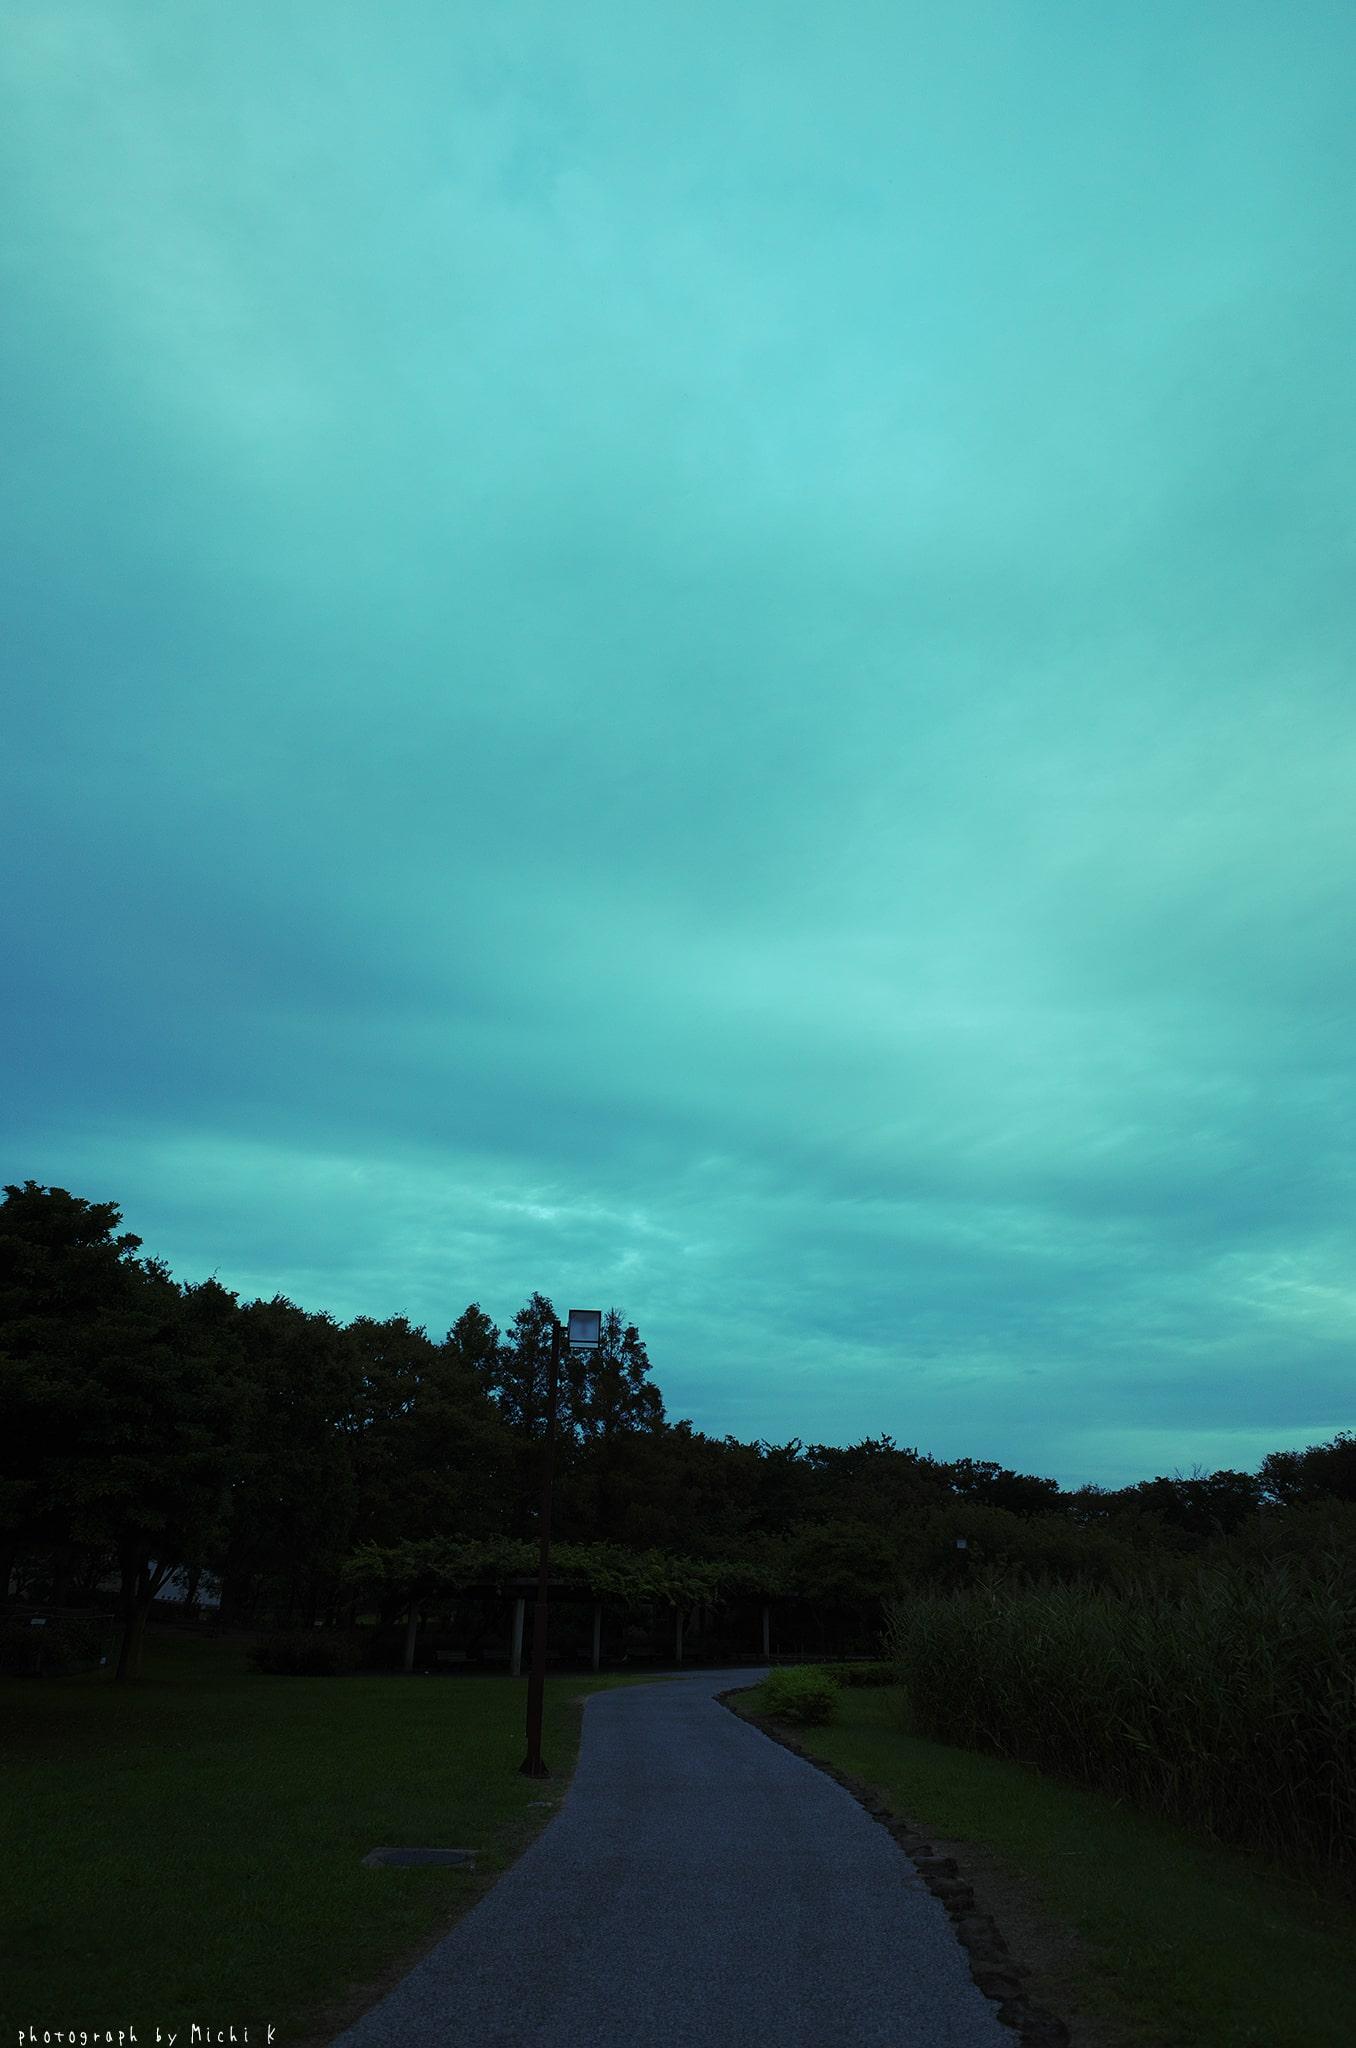 土門拳記念館2019-9-21夕方(写真その6)